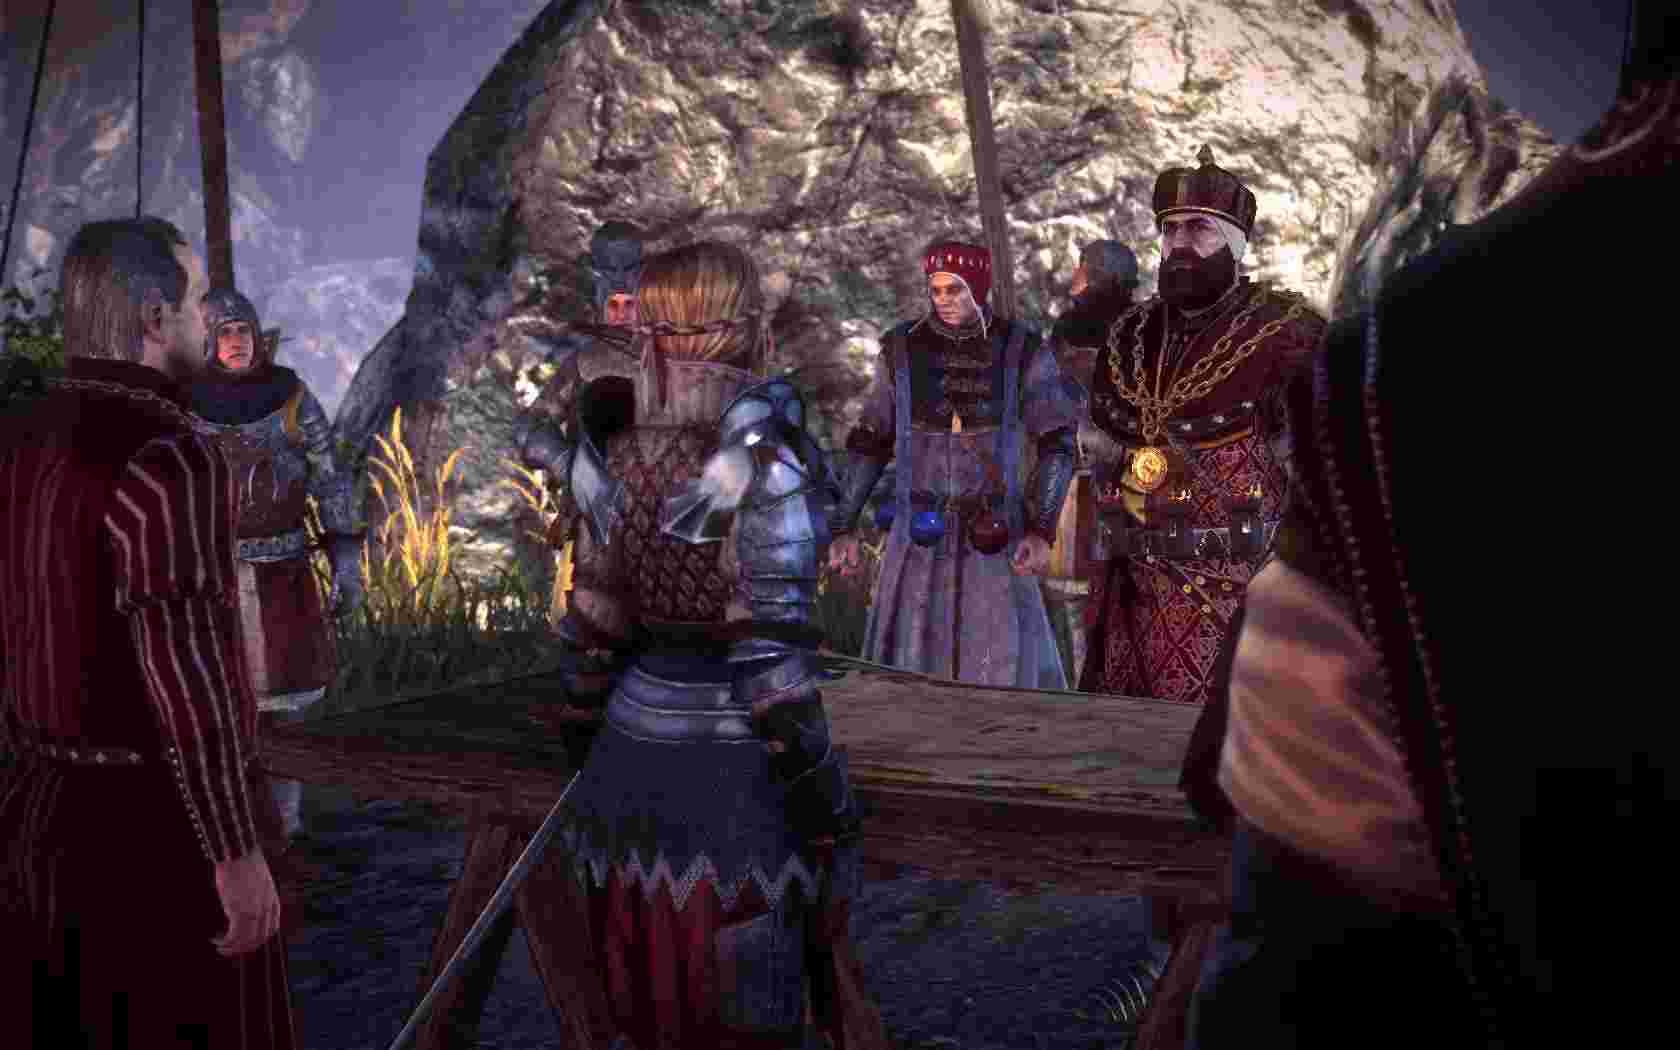 Witcher-2-Assassins-of-Kings-Enhanced-Edition-Walkthrough-Prelude-to-War-Aedirn-Quest